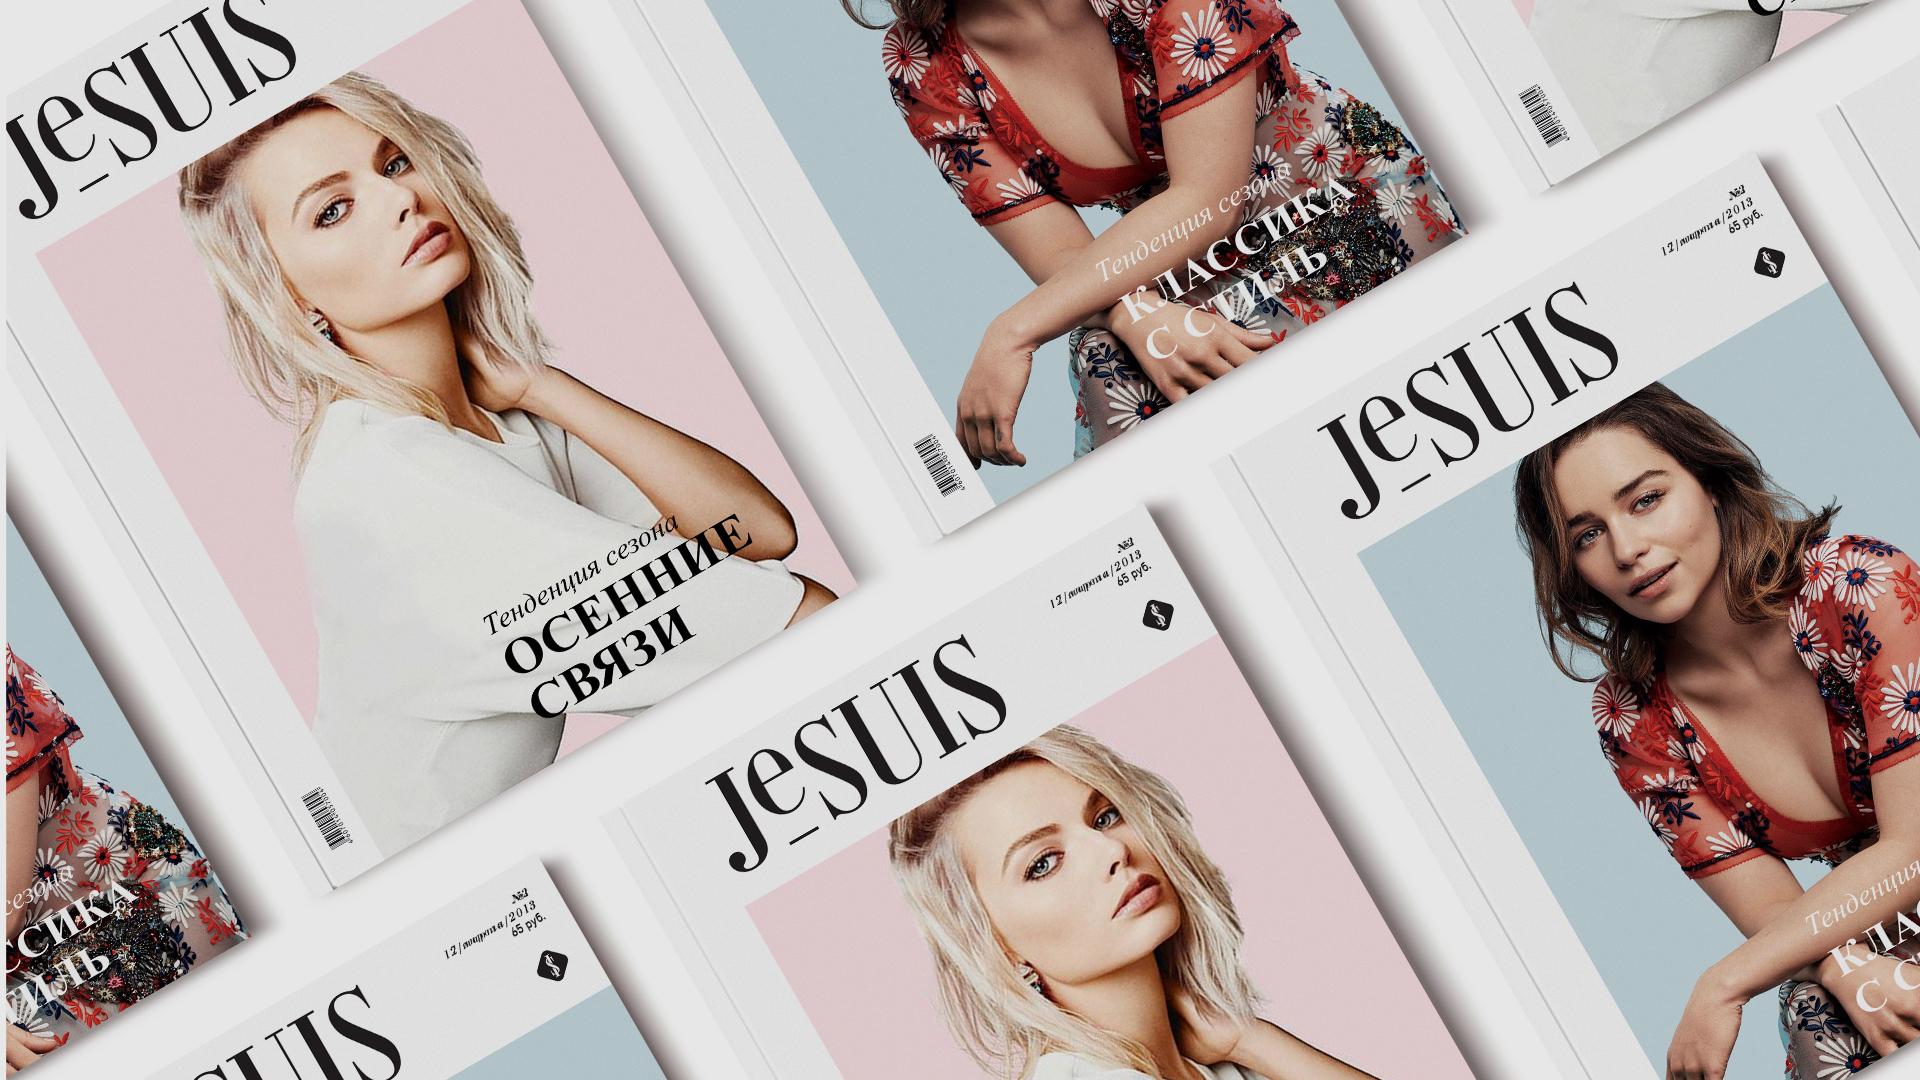 Je_SuisMagazines.jpg